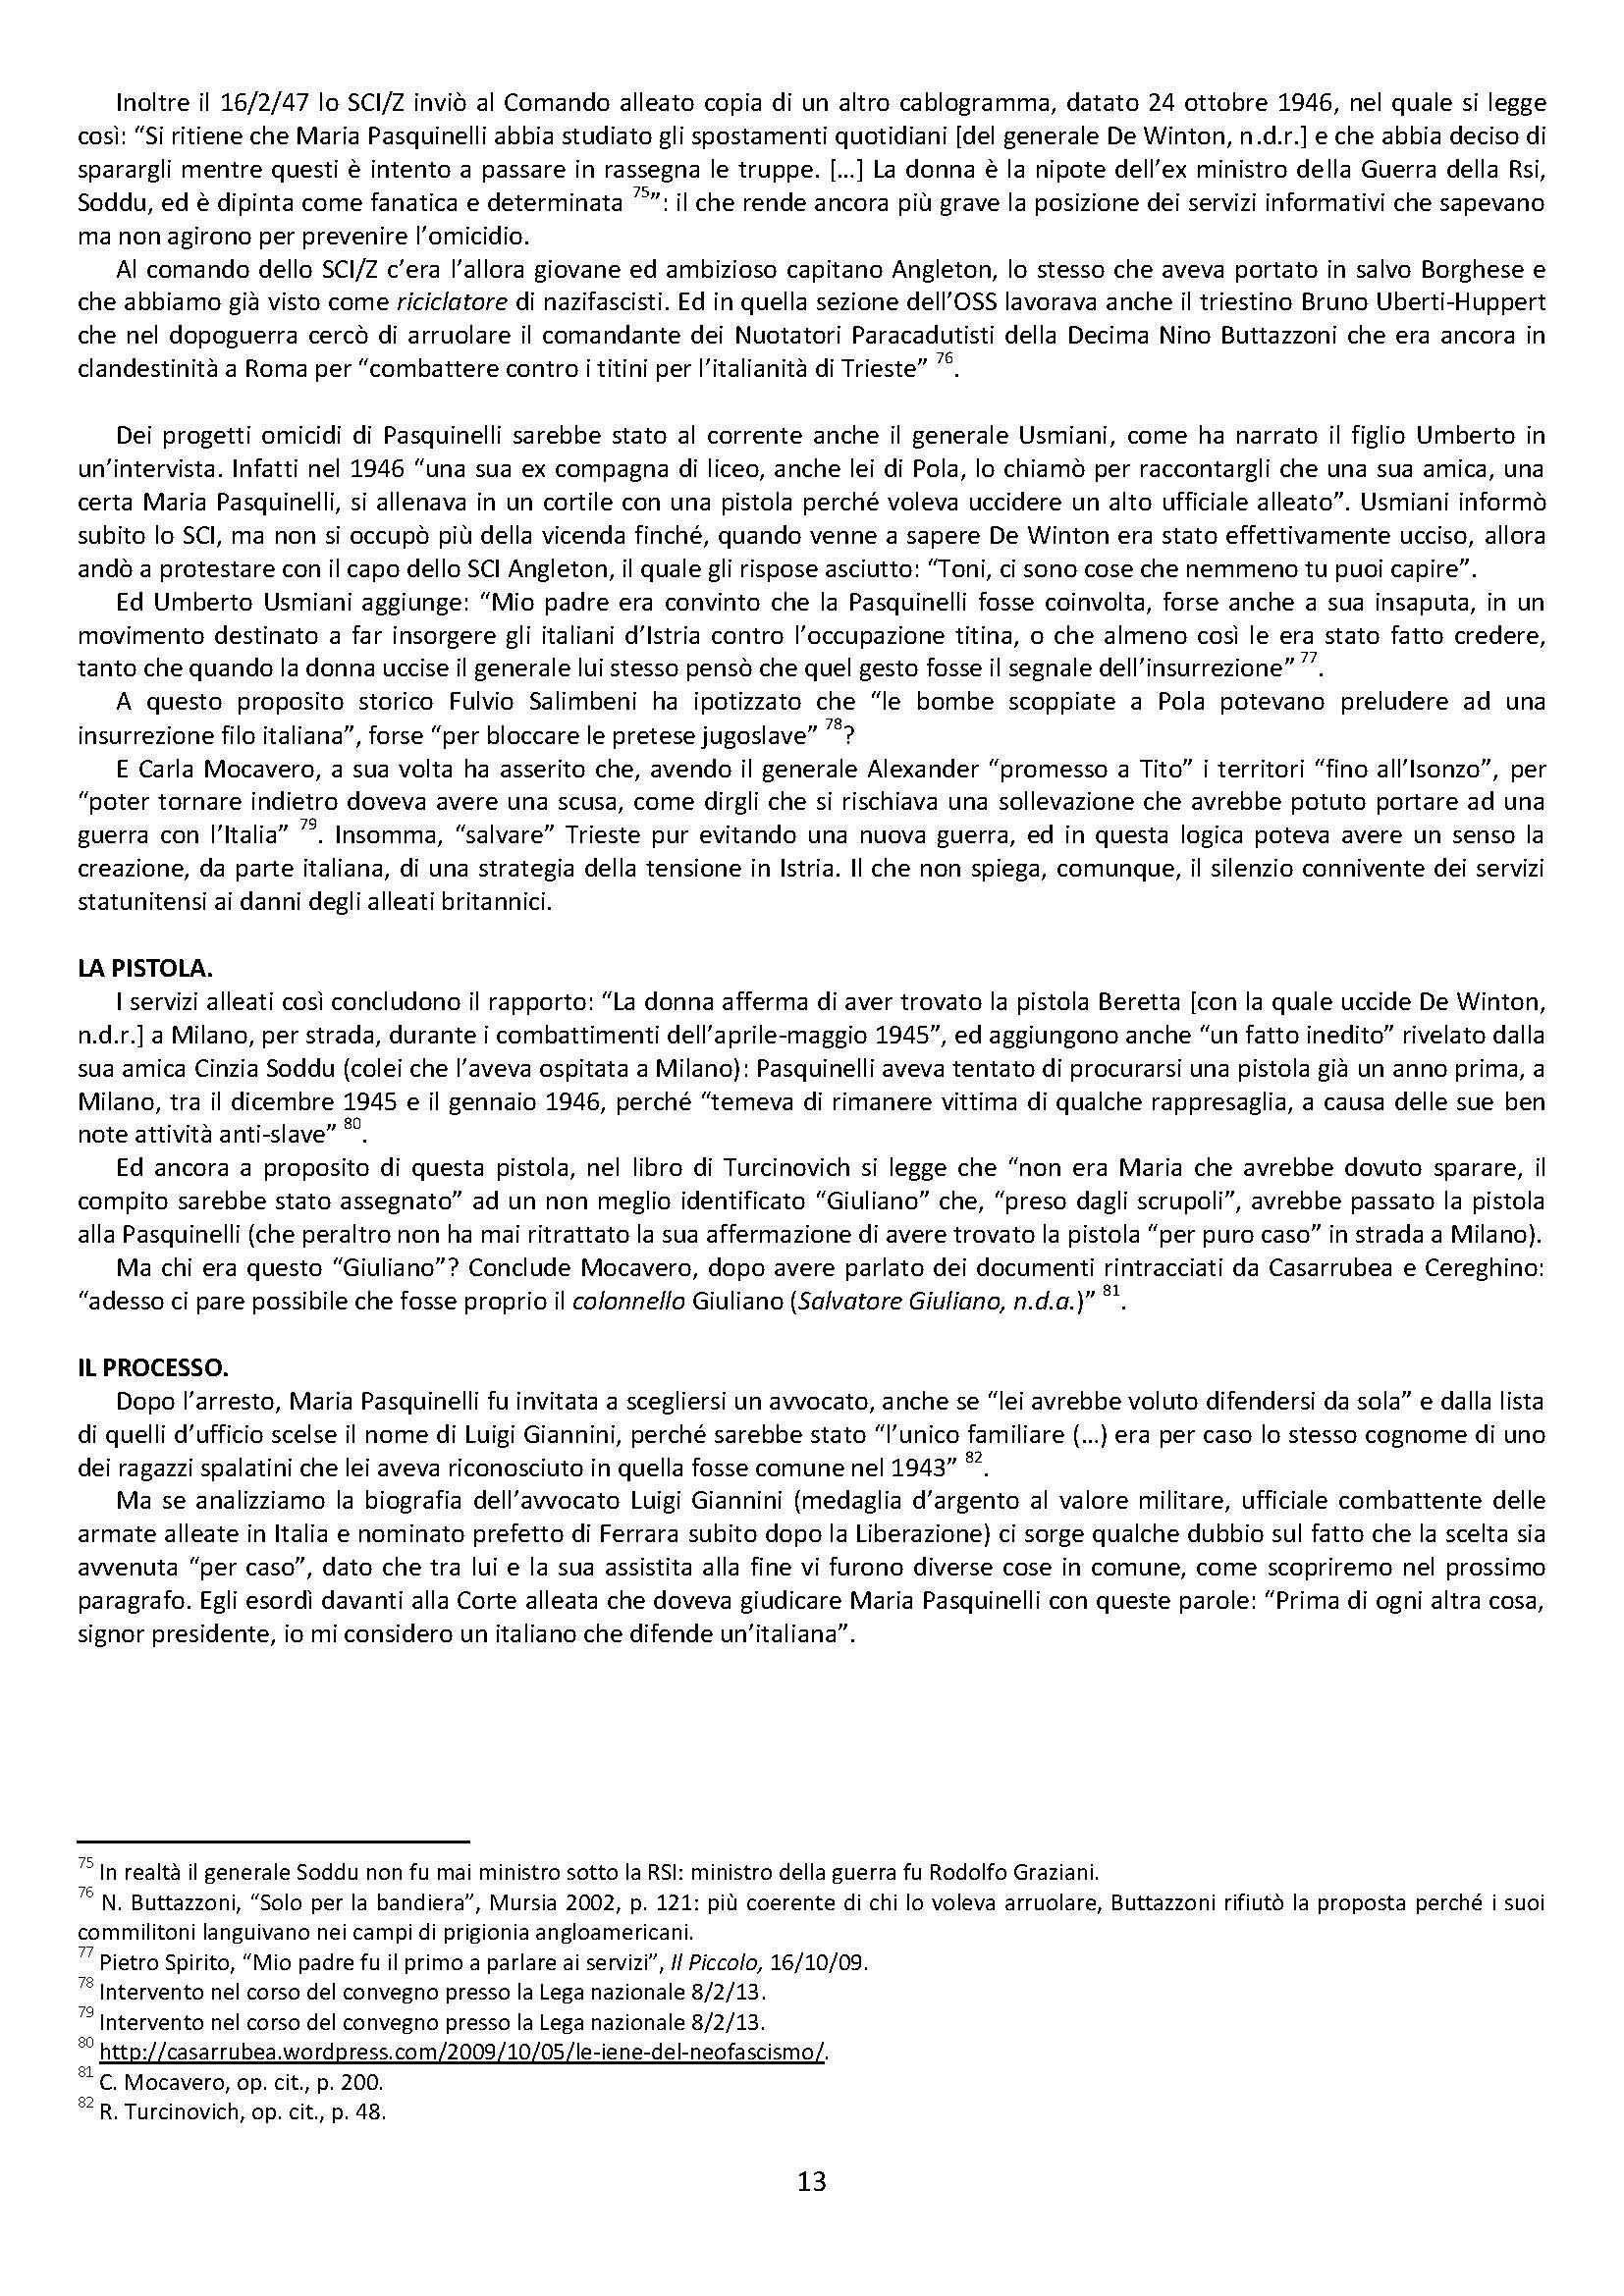 dossier-maria-pasquinelli_Page_13